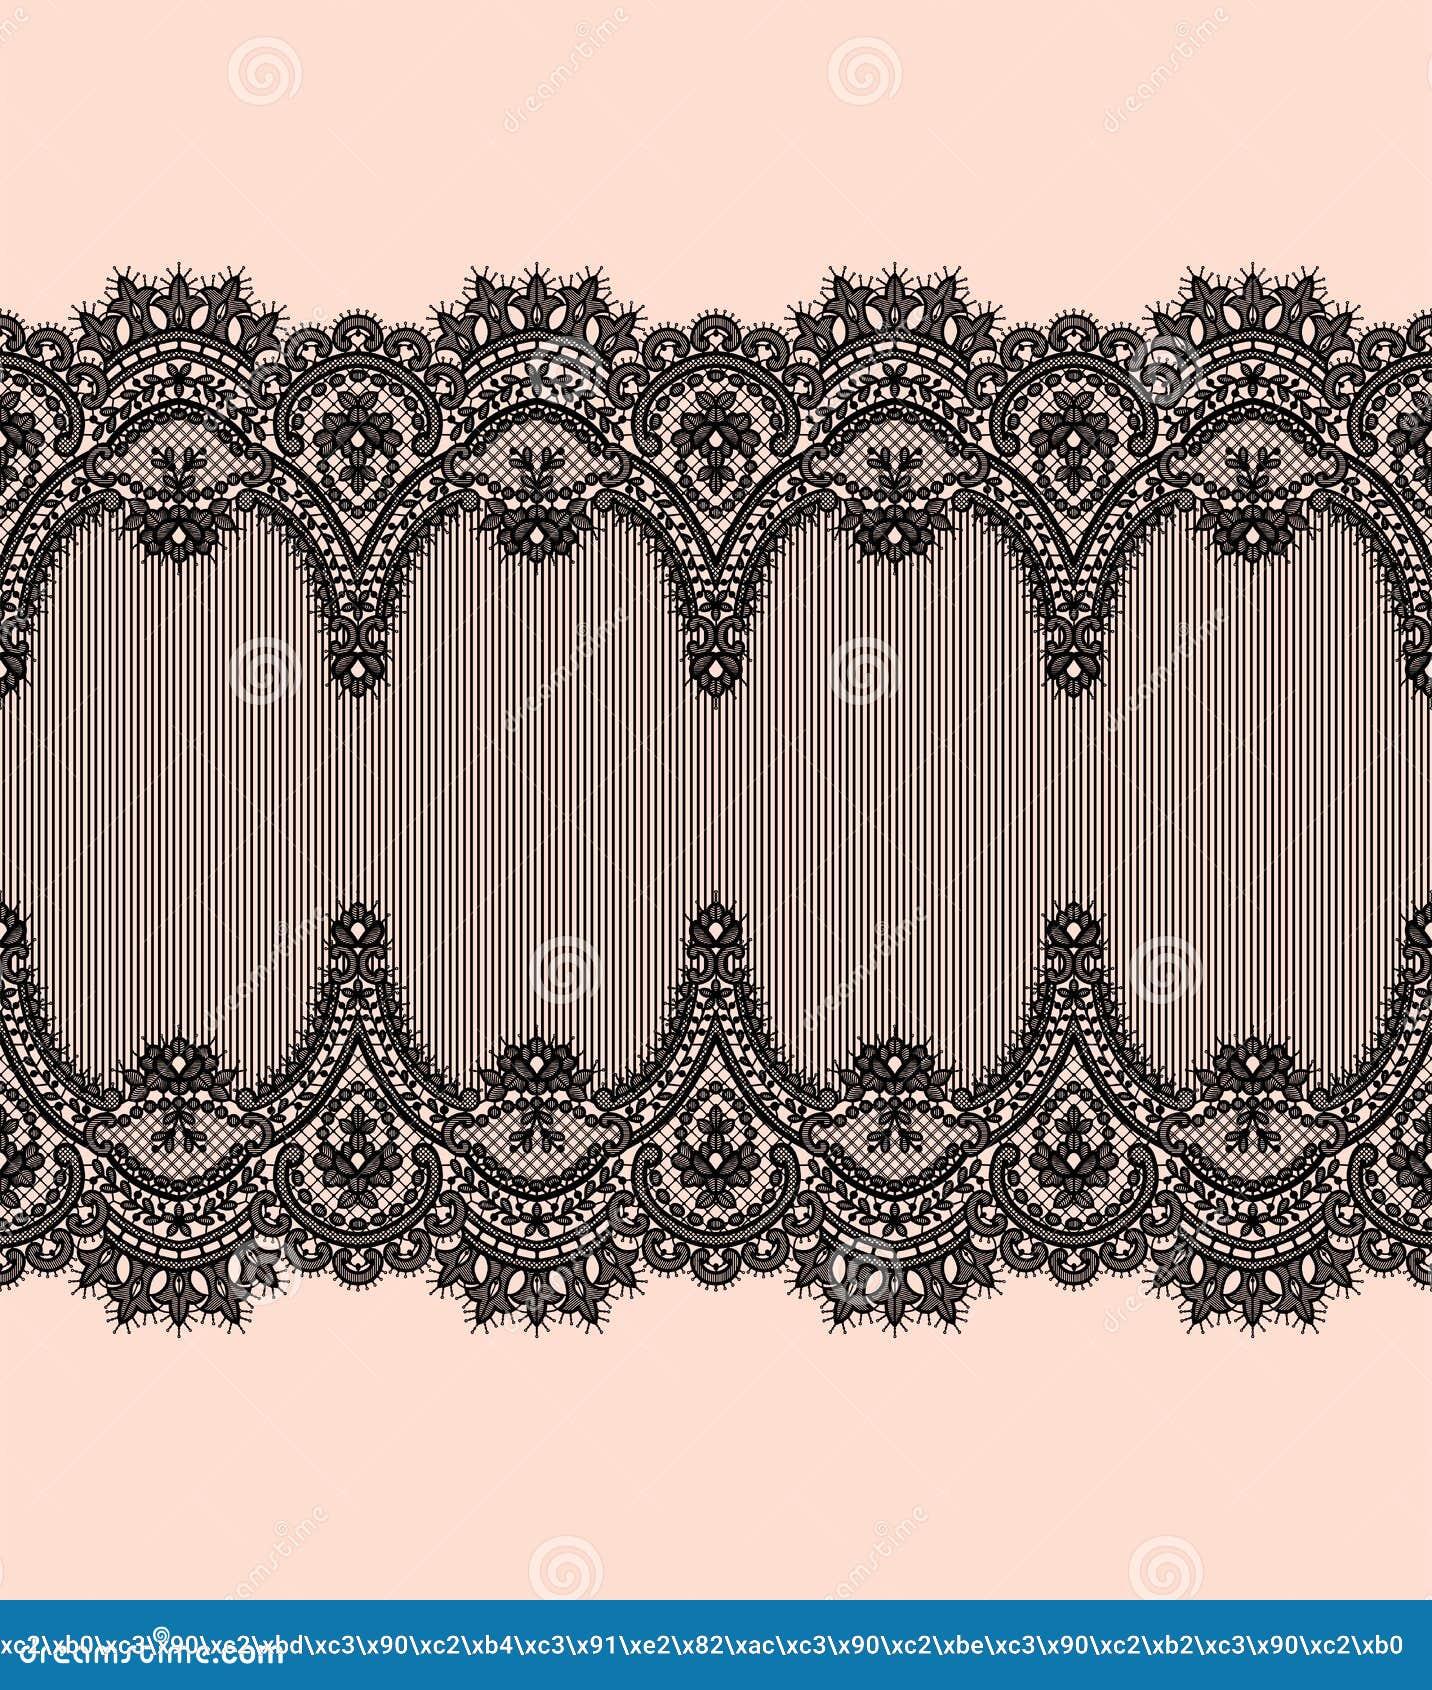 Black Lace Vector Pattern. Horizontal Ribbon. Border.